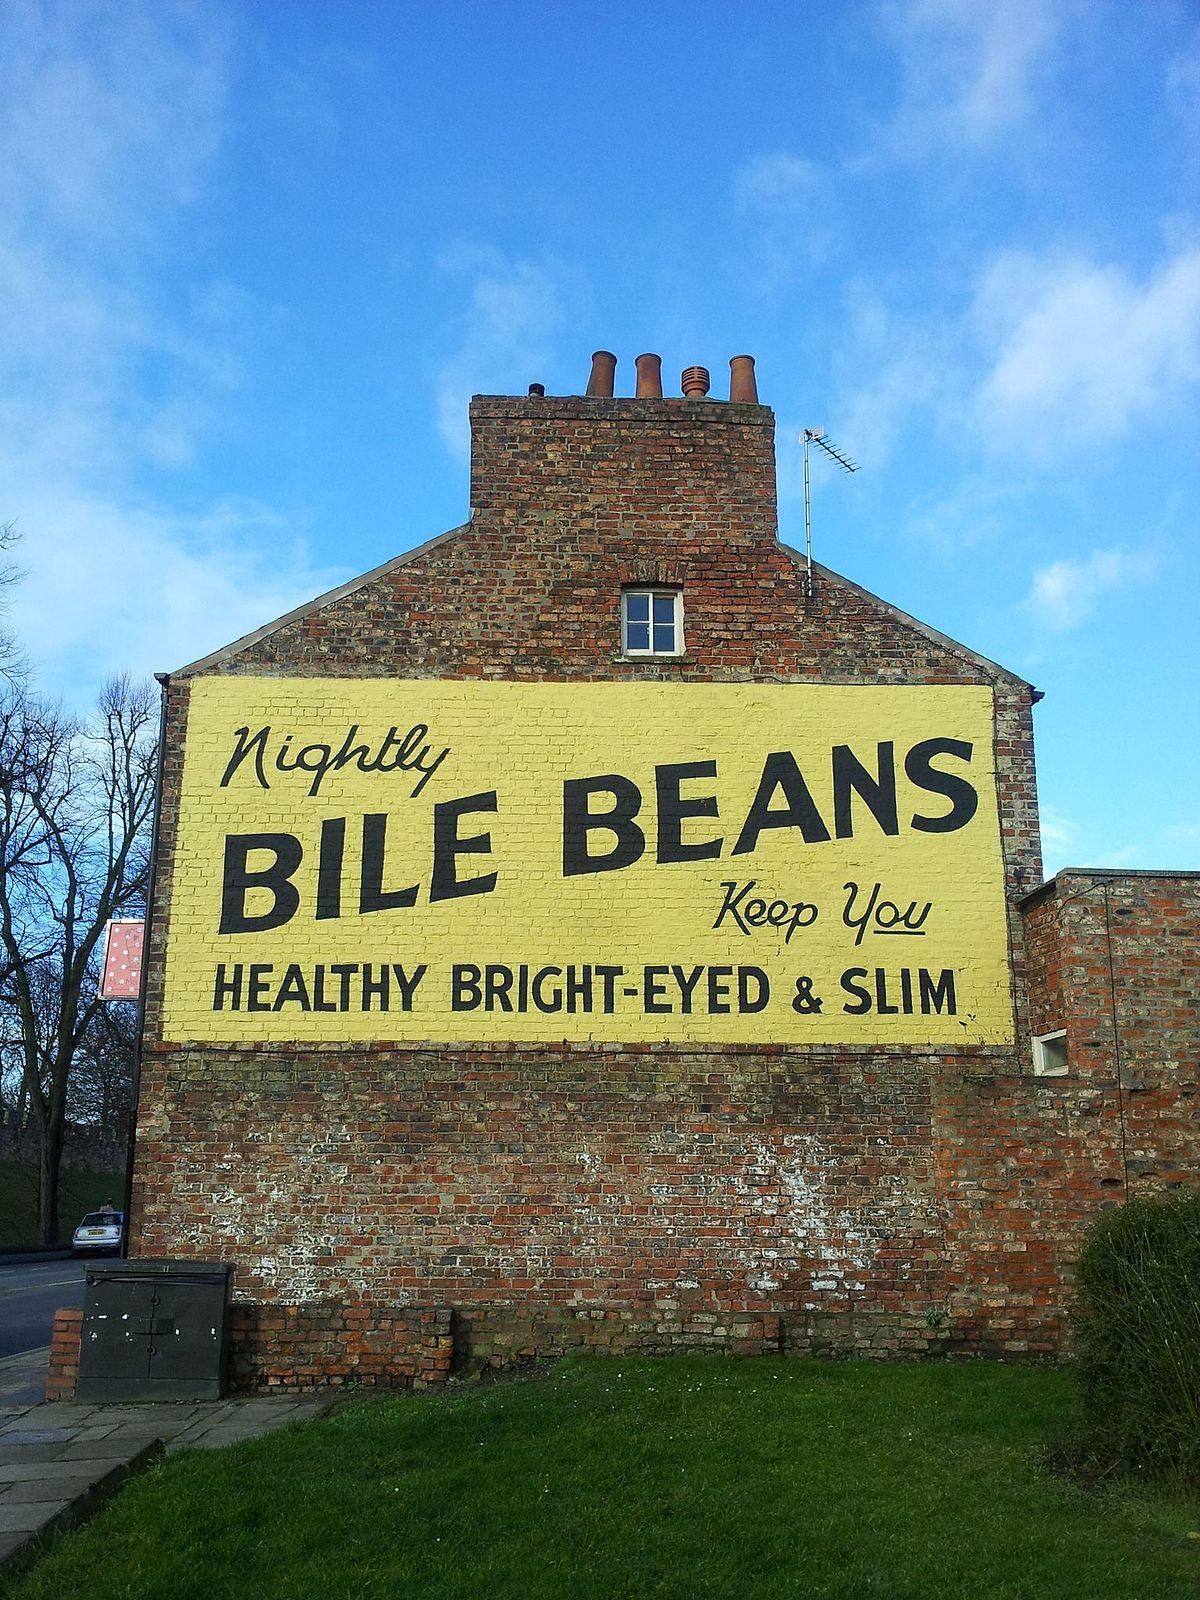 Bile Beans Wikipedia